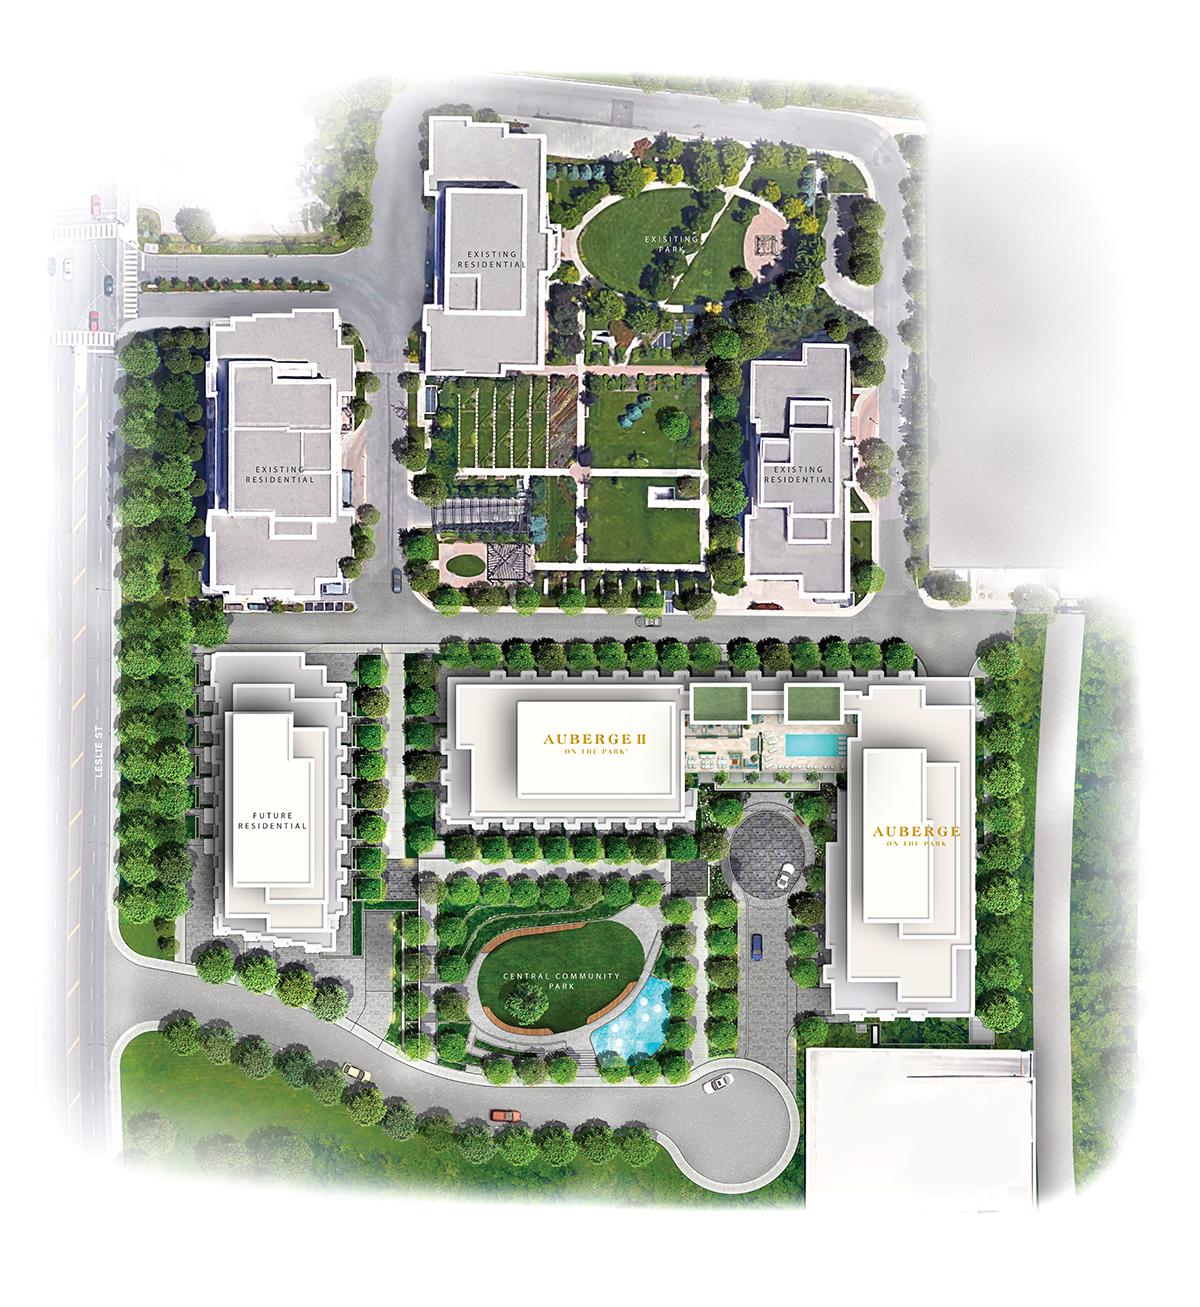 Auberge Masterplan